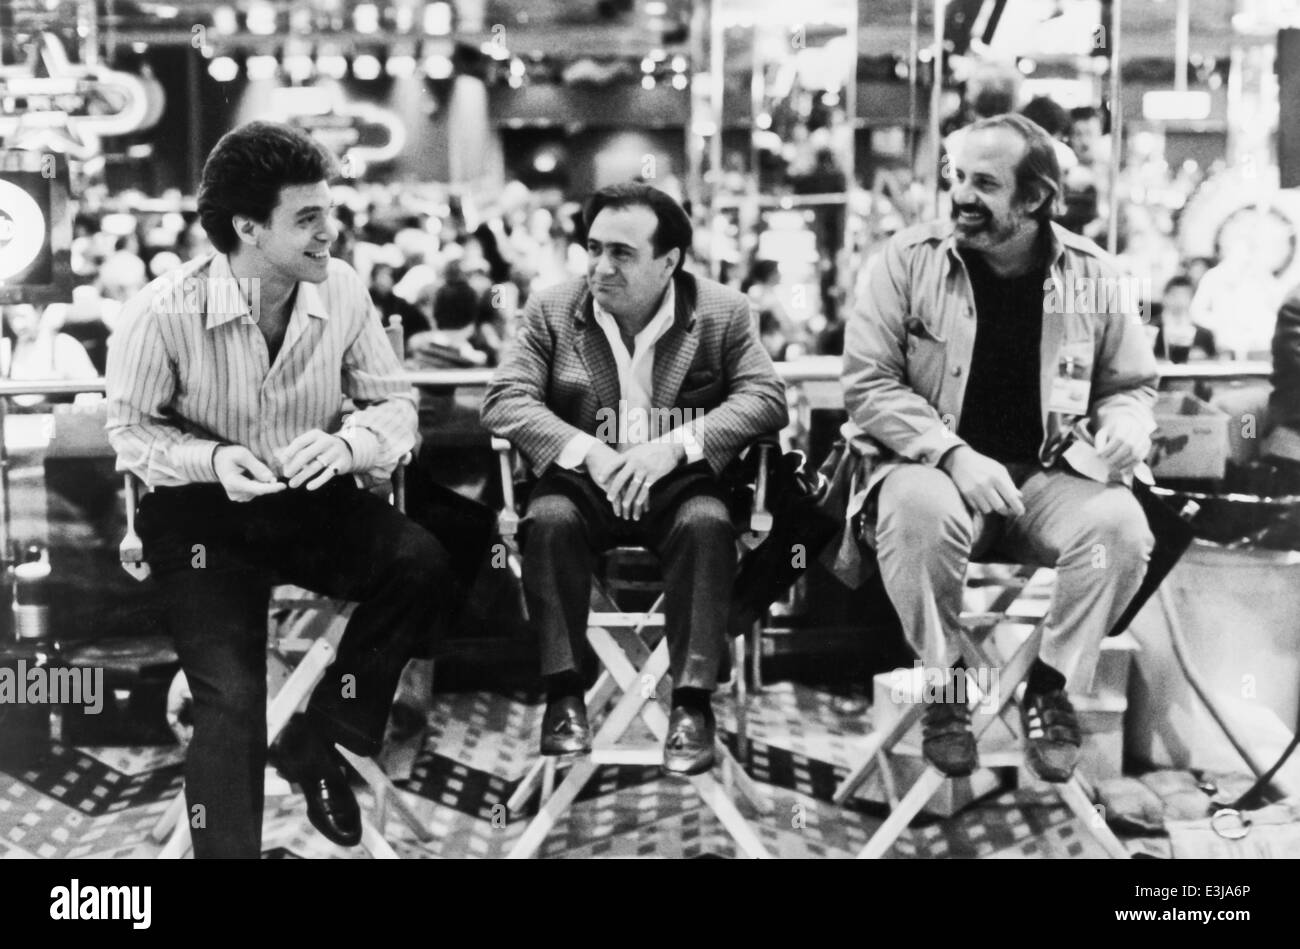 joe piscopo,danny de vito,brian de palma,wise guys,1986 - Stock Image